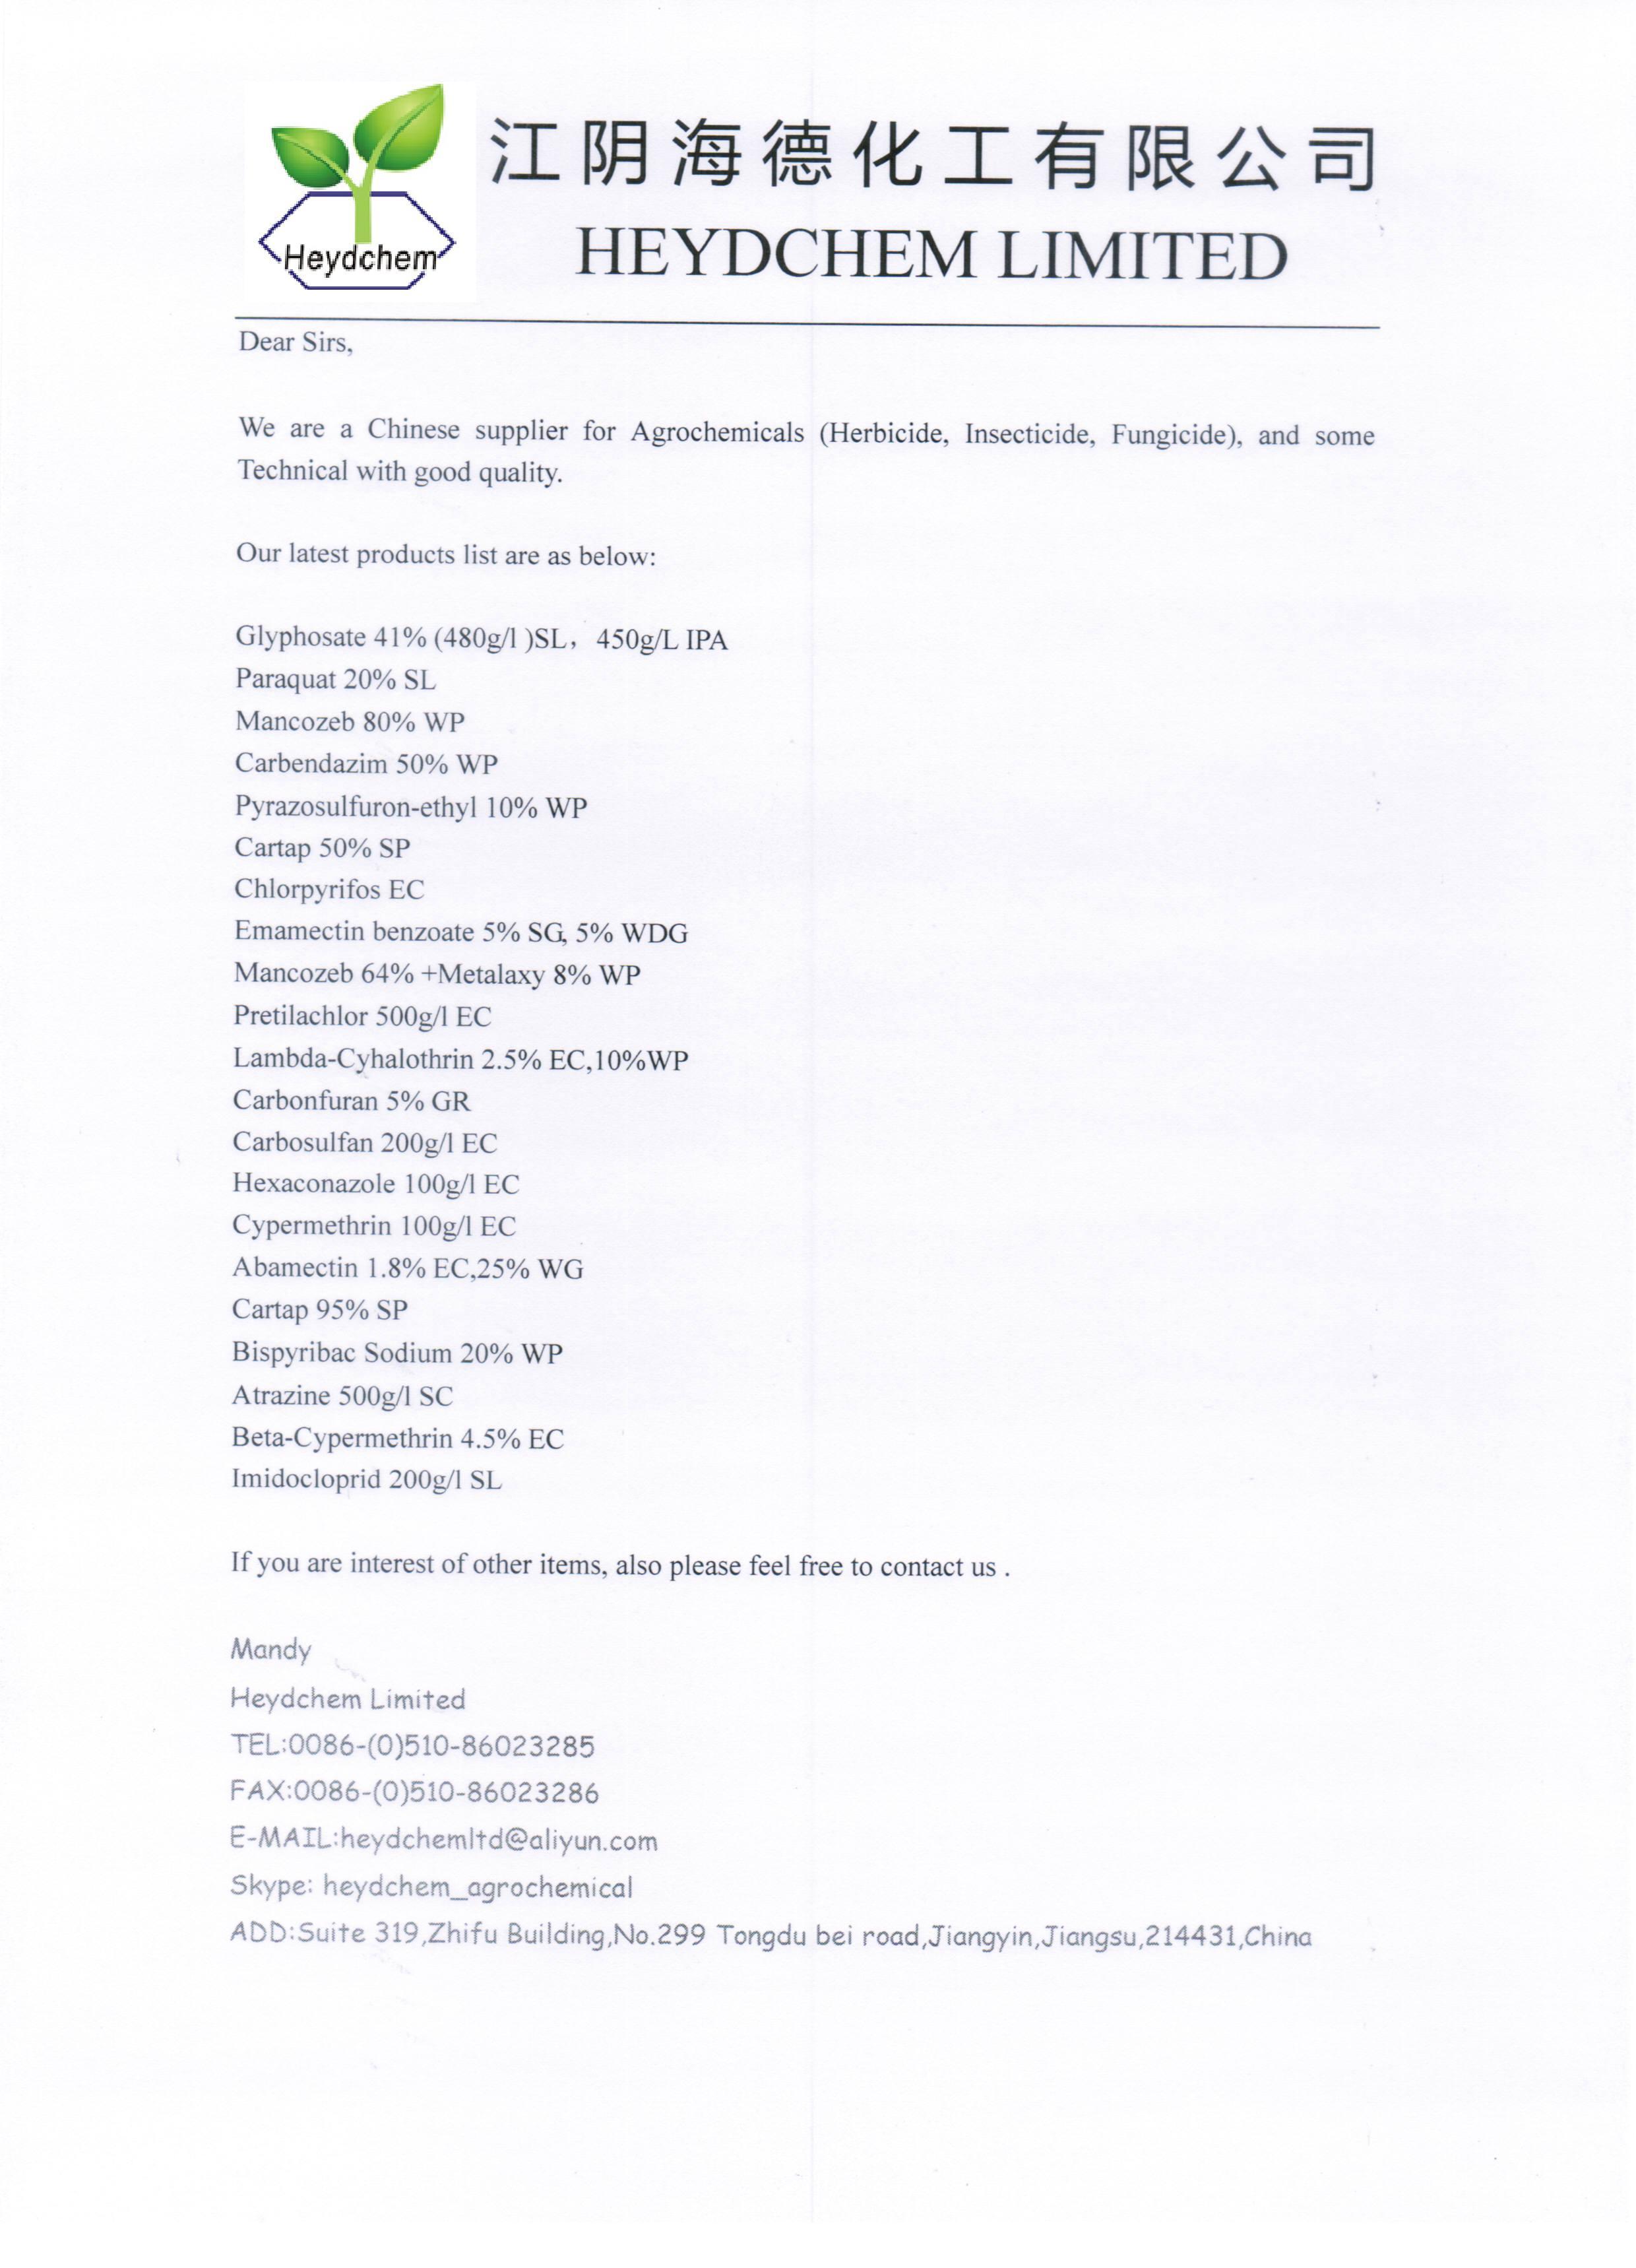 Lambda-Cyhalothrin 2.5% EC,10%WP